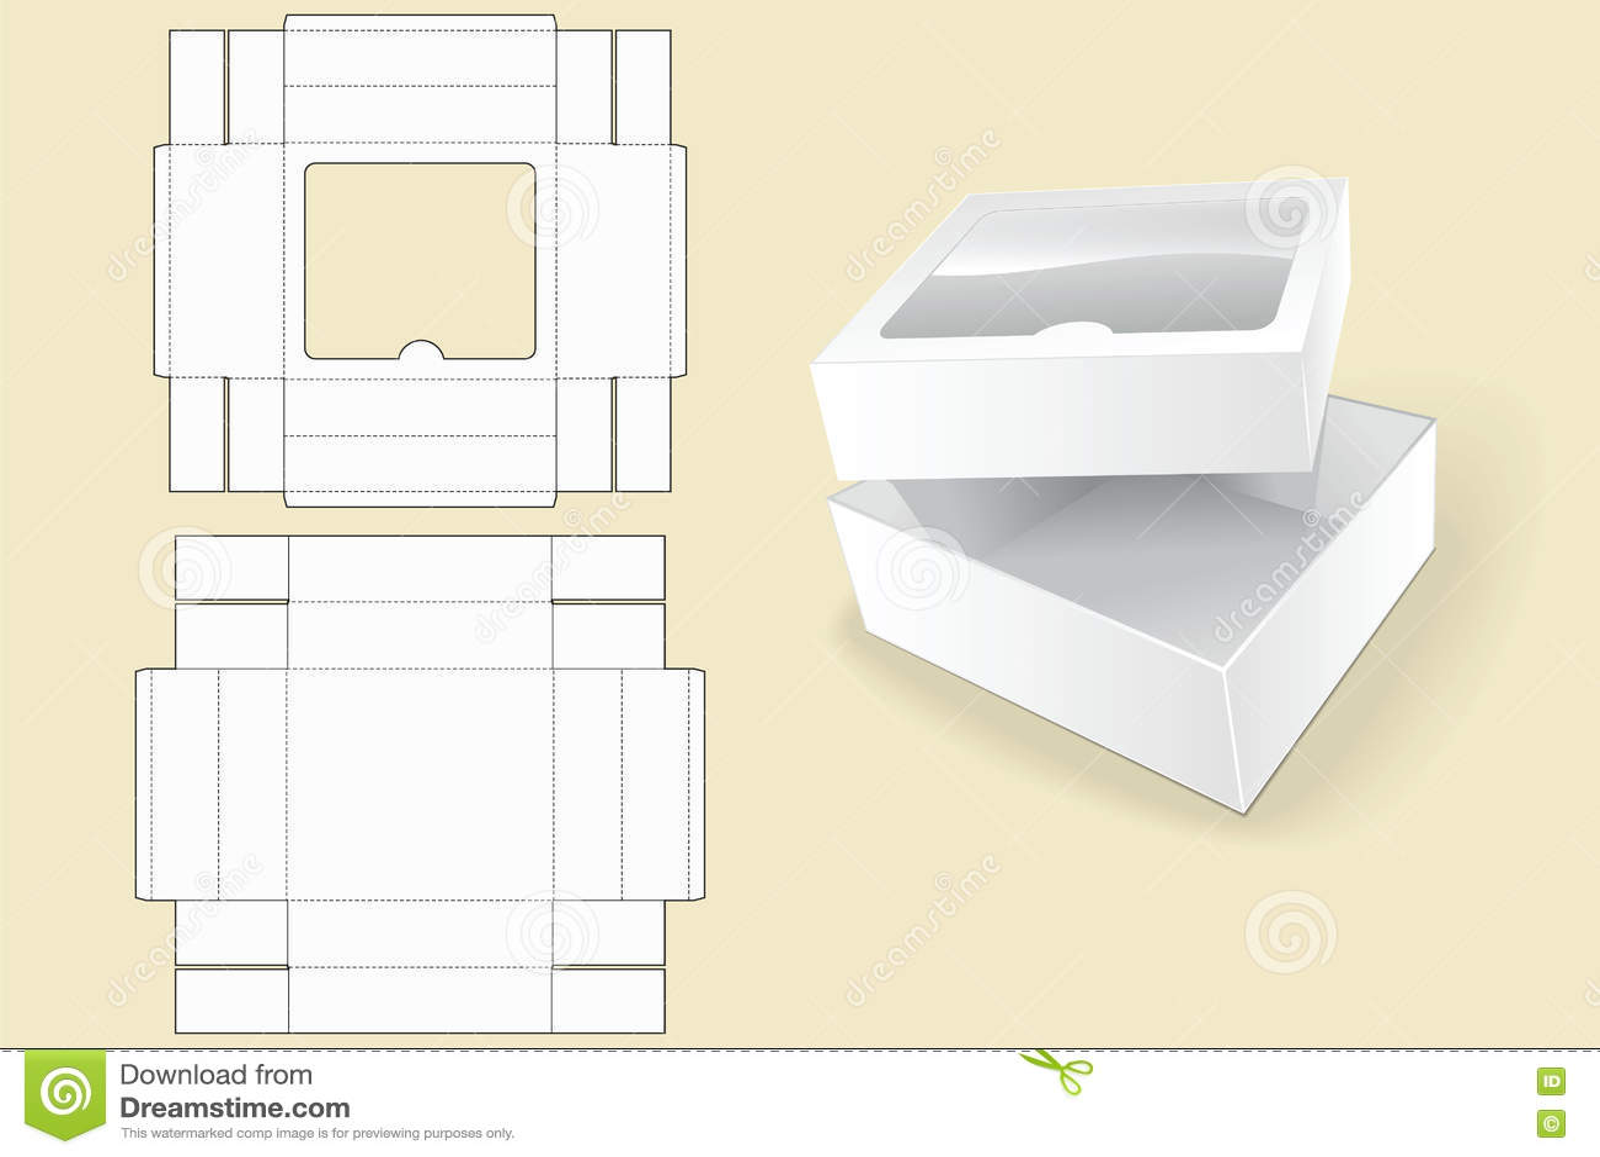 box template packaging white cardboard box opened white cardboard